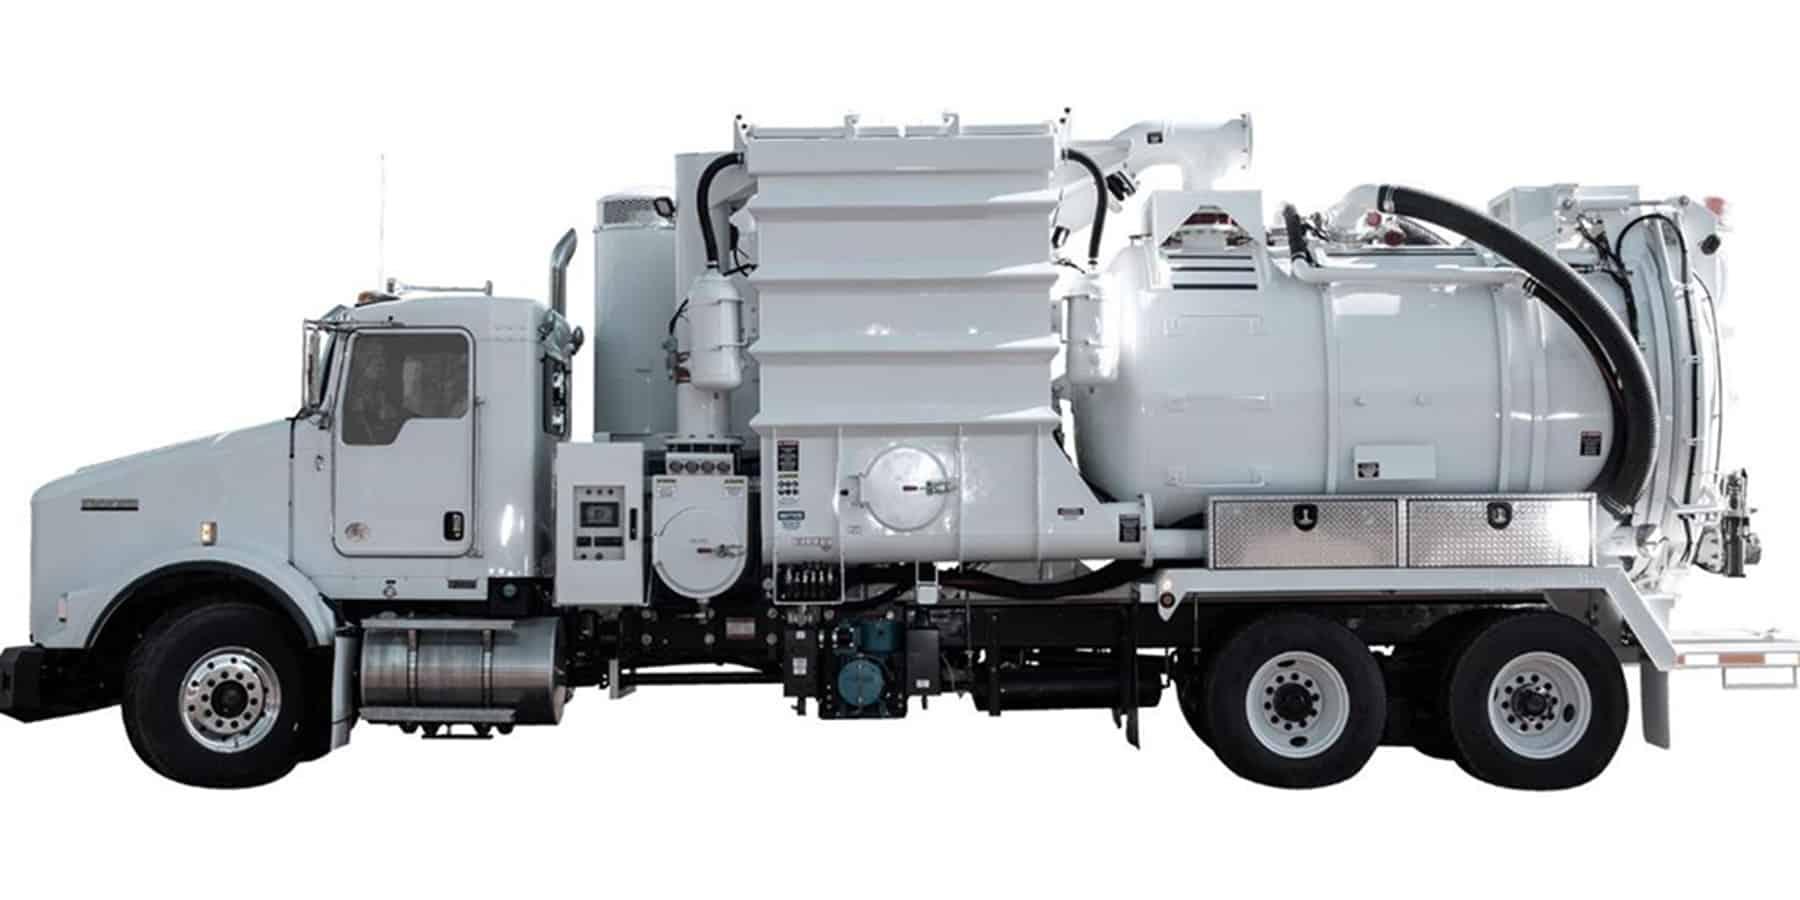 Construction Utility Vehicles